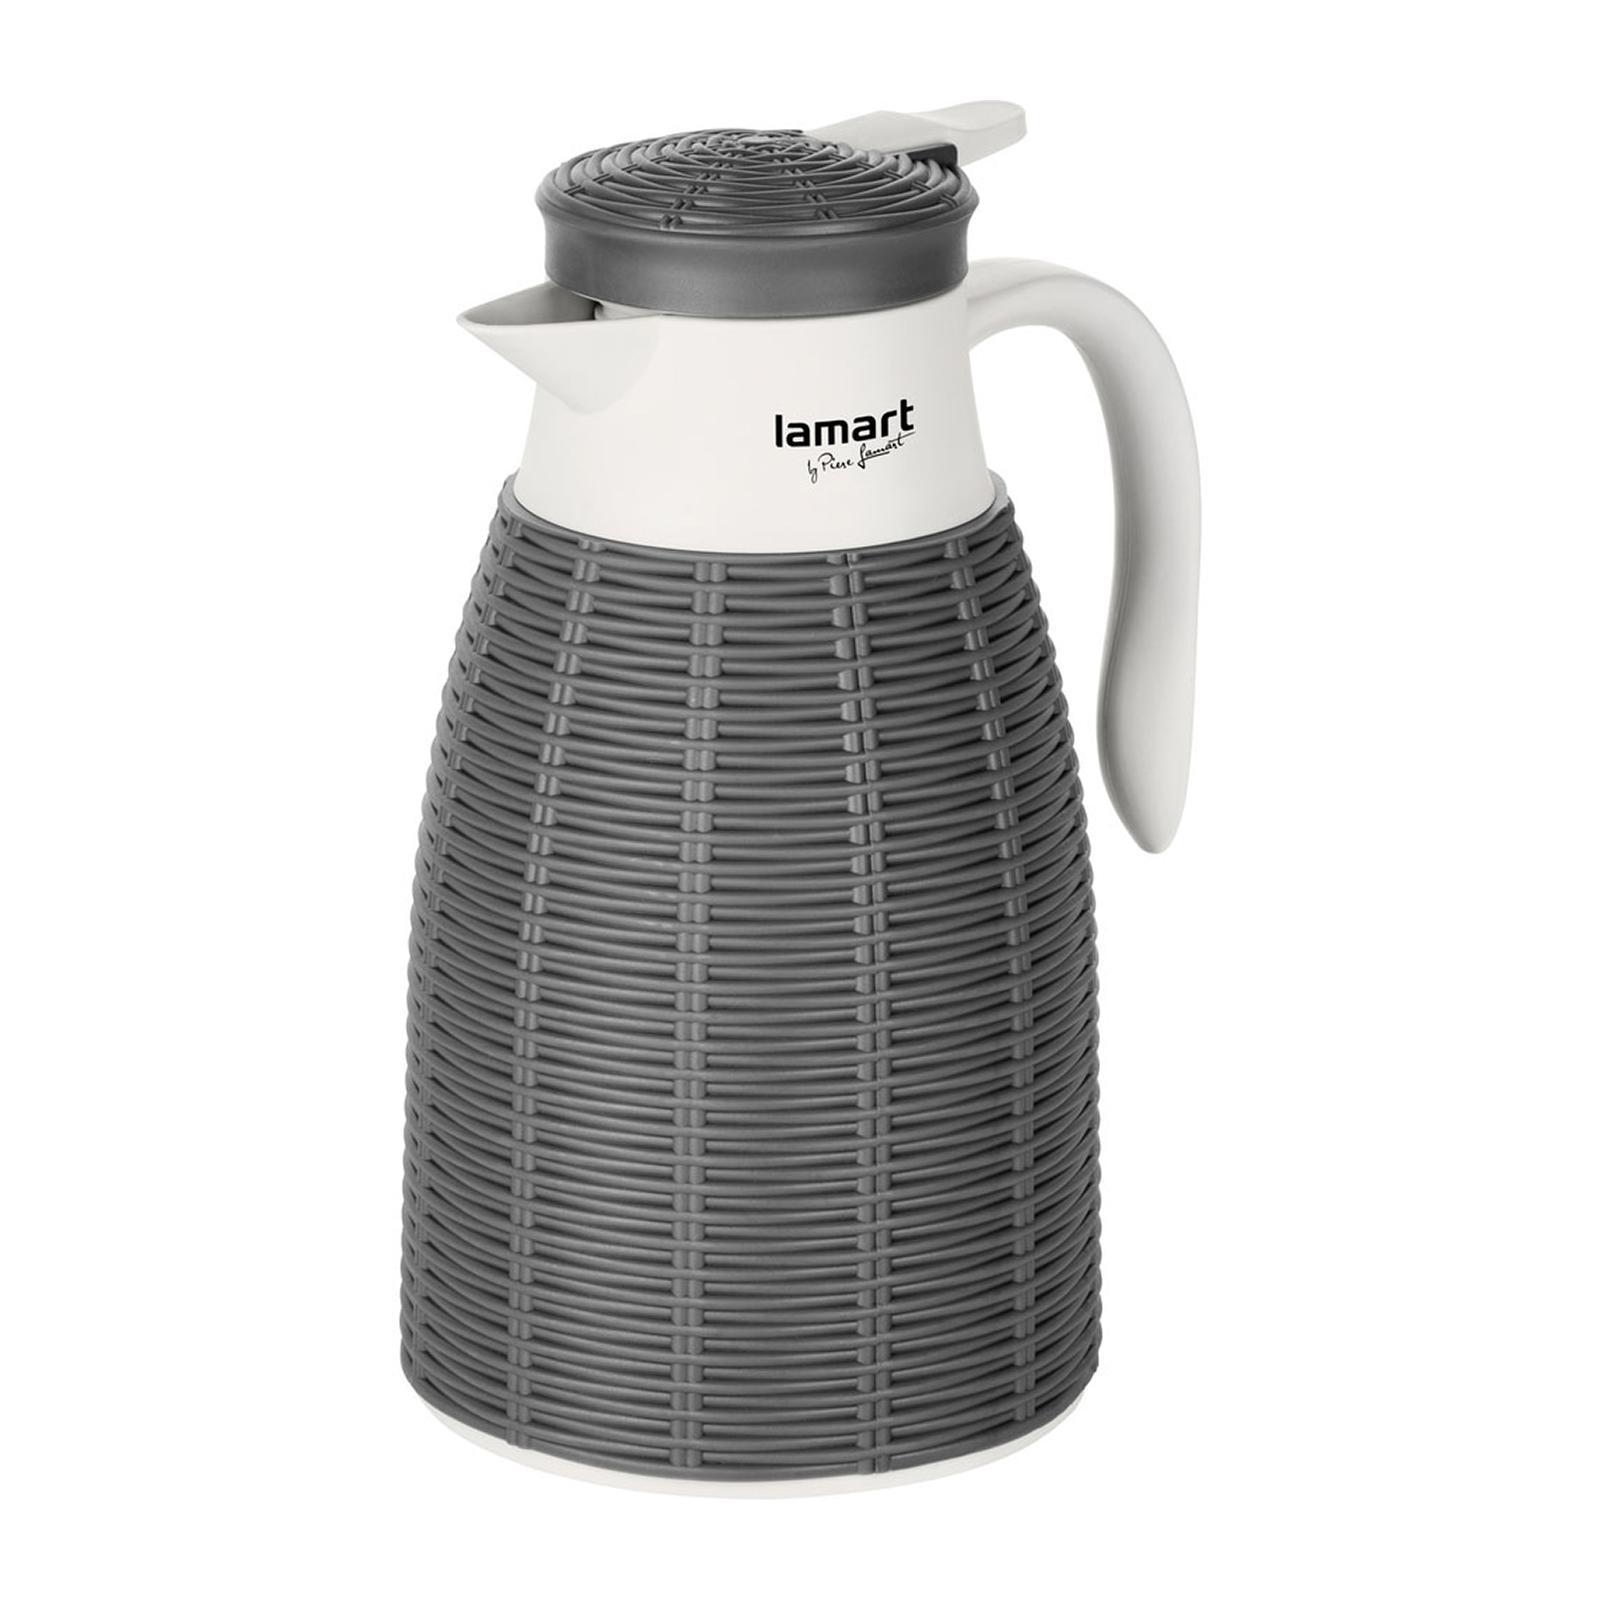 Lamart Vacuum Flask 1L - Ratan Grey